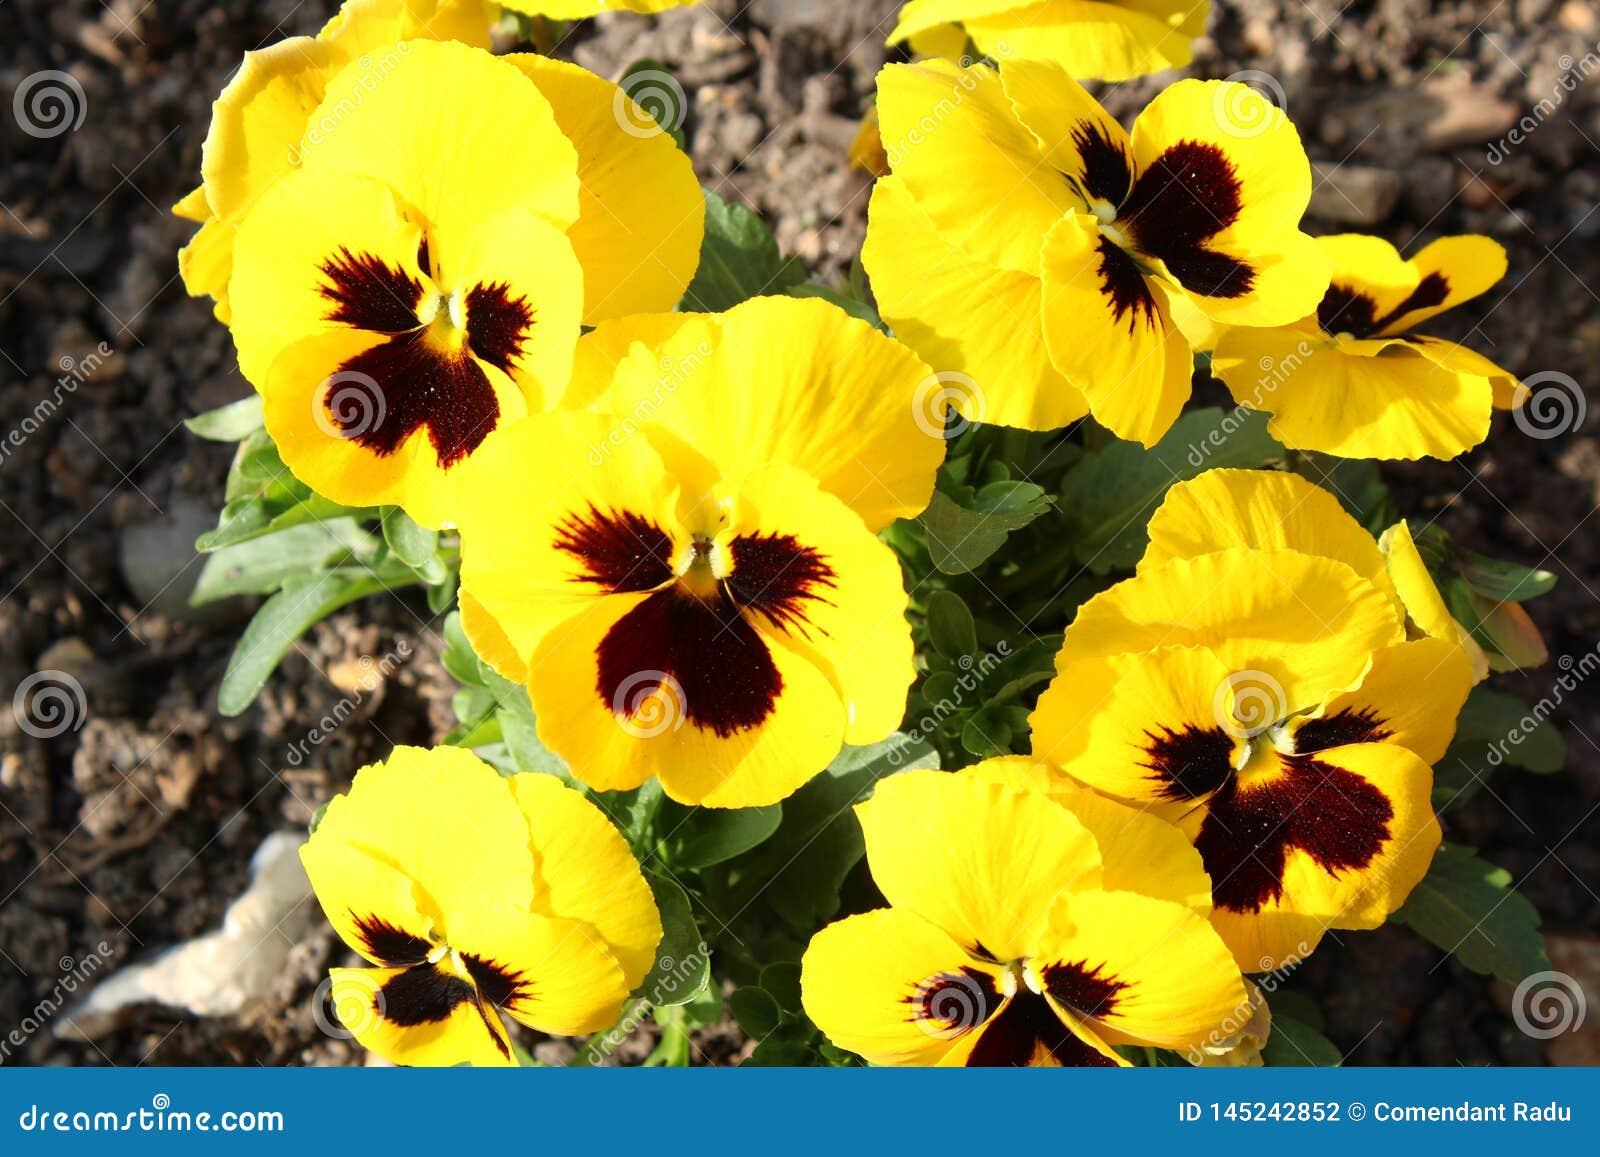 Den gula v?ren blommar i en tr?dg?rd